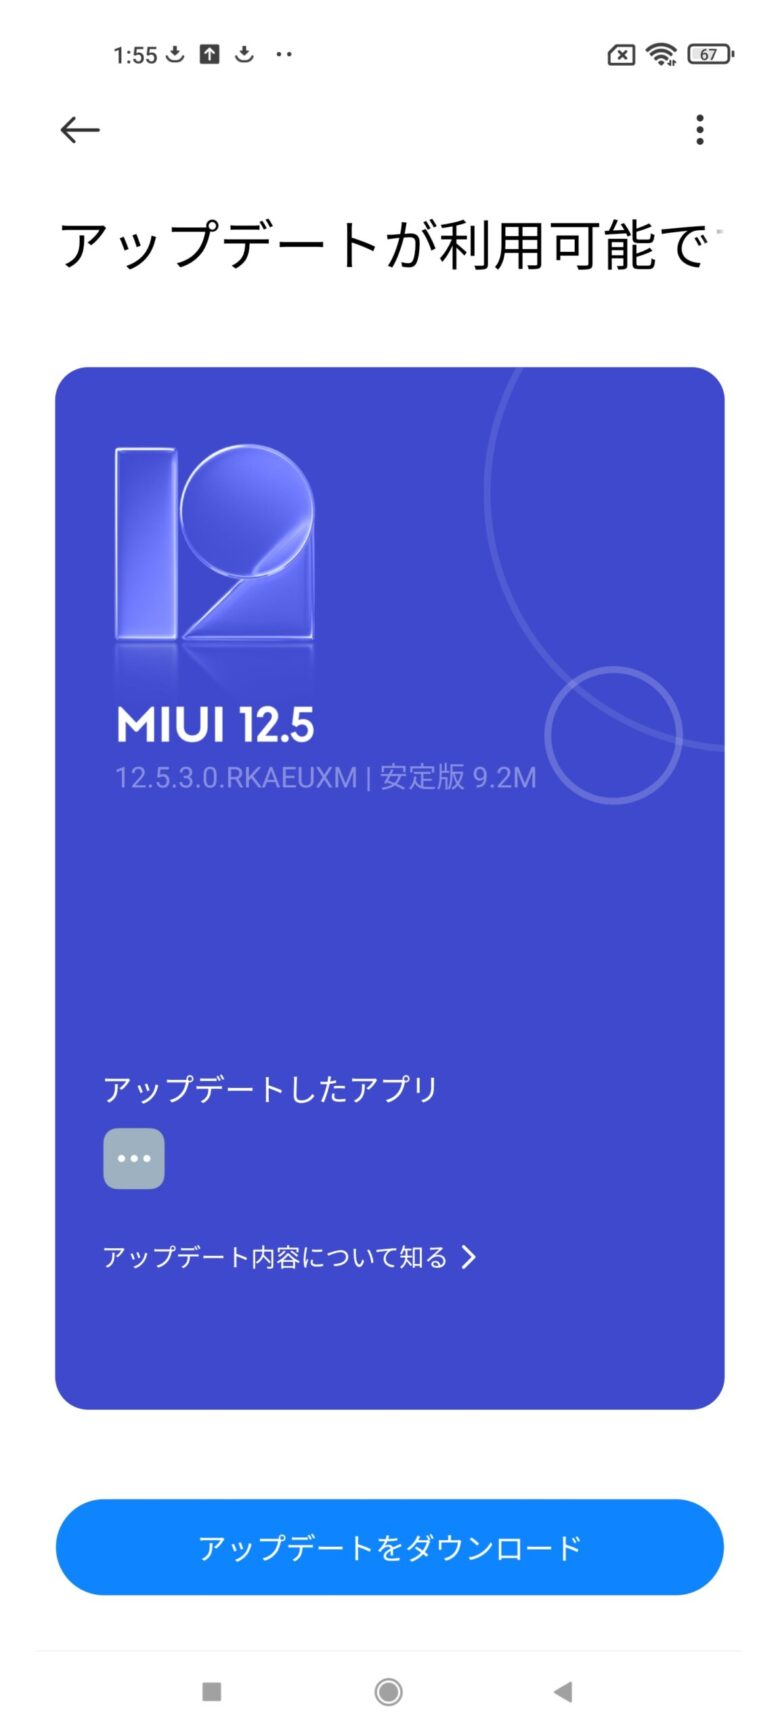 Xiaomi Mi11 UltraのV12.5.3.0.RKAEUXMのOTAアップデート画面。